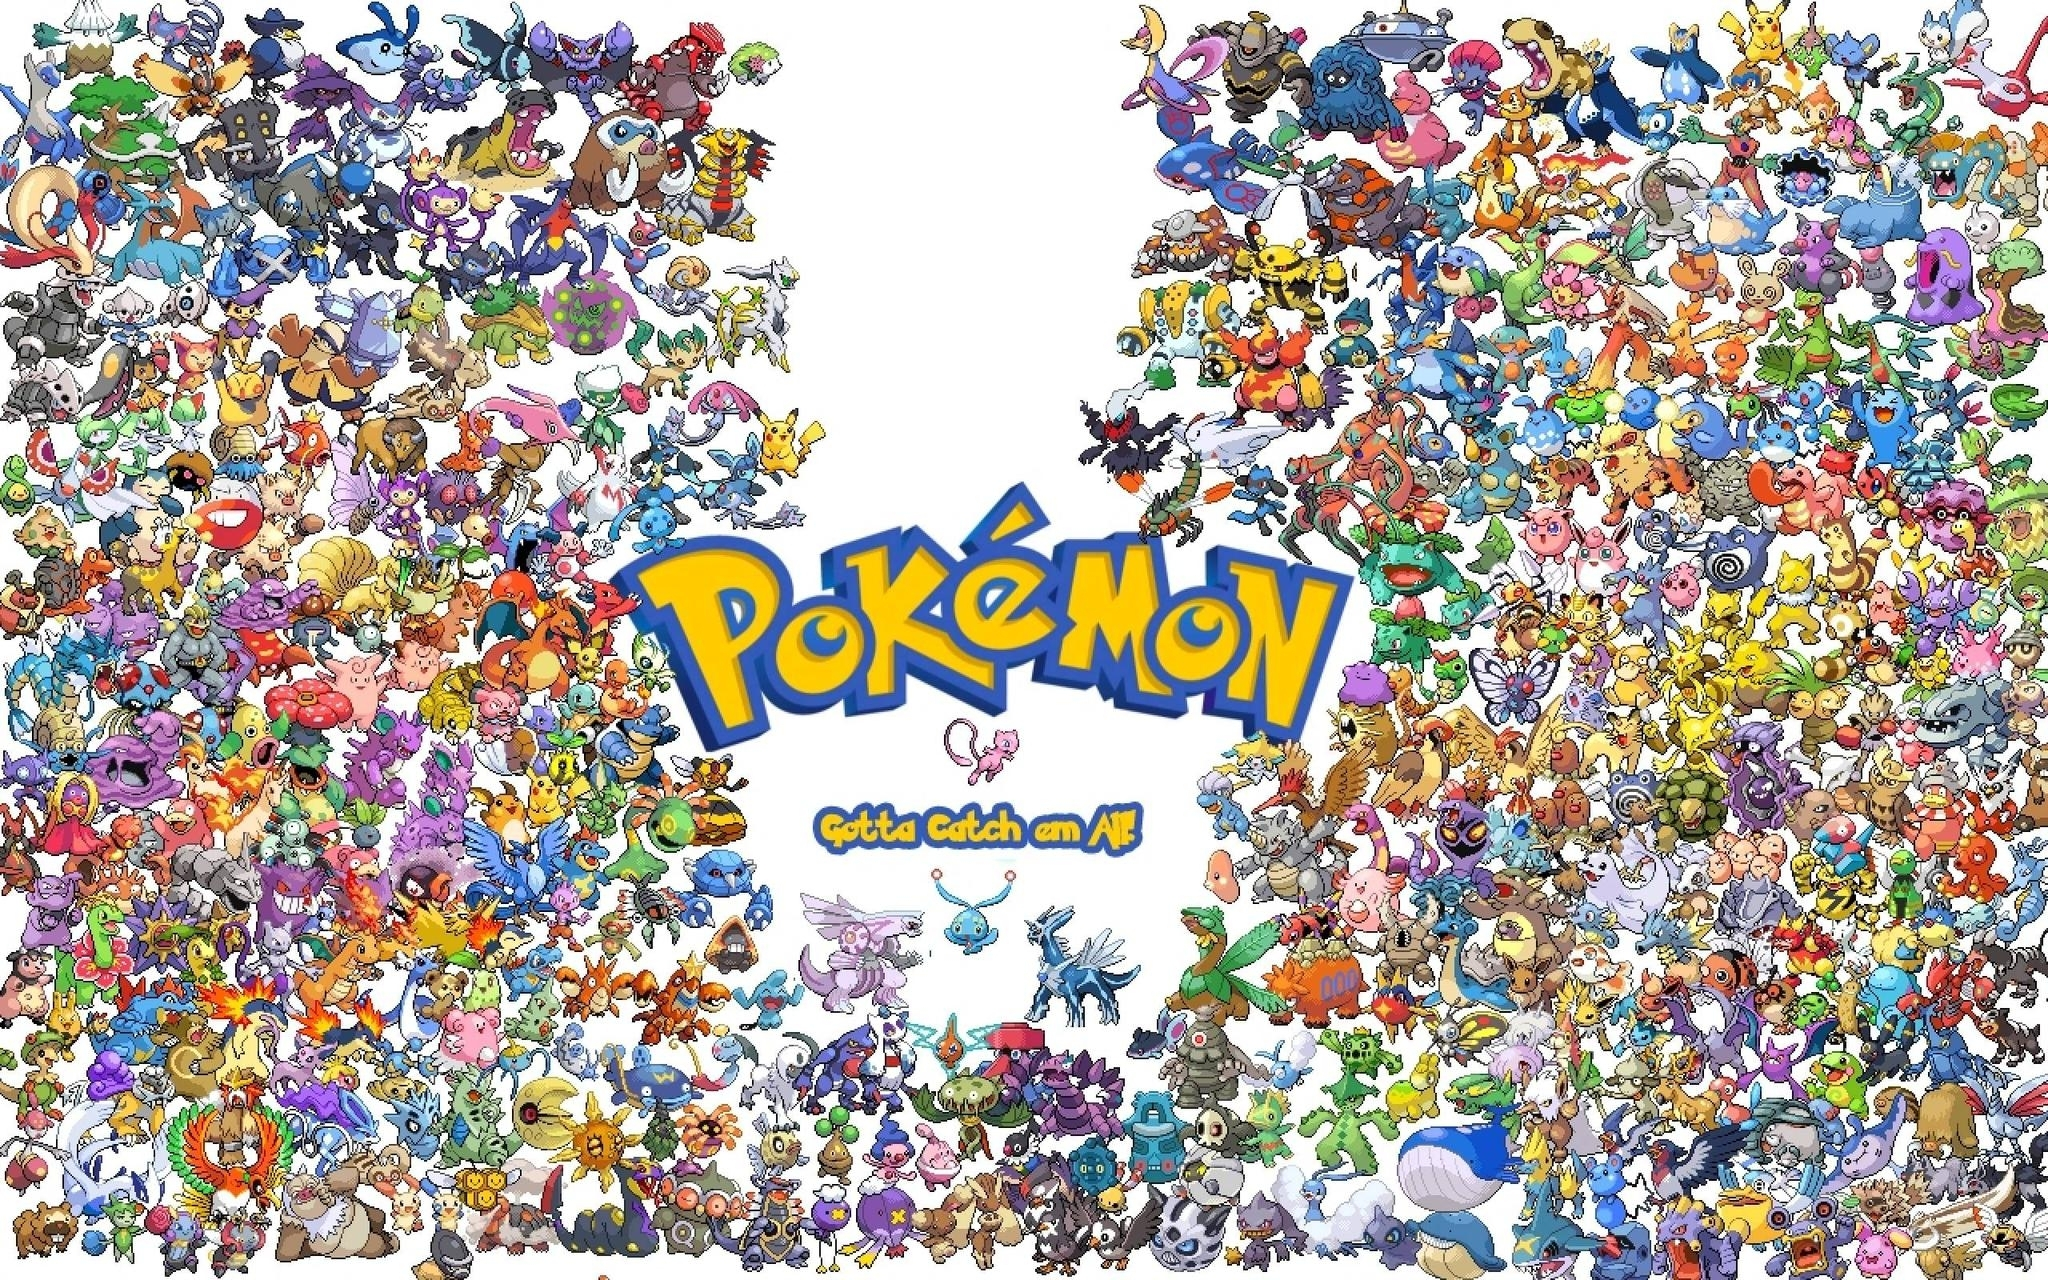 gotta catch them all - pokemon wallpaper